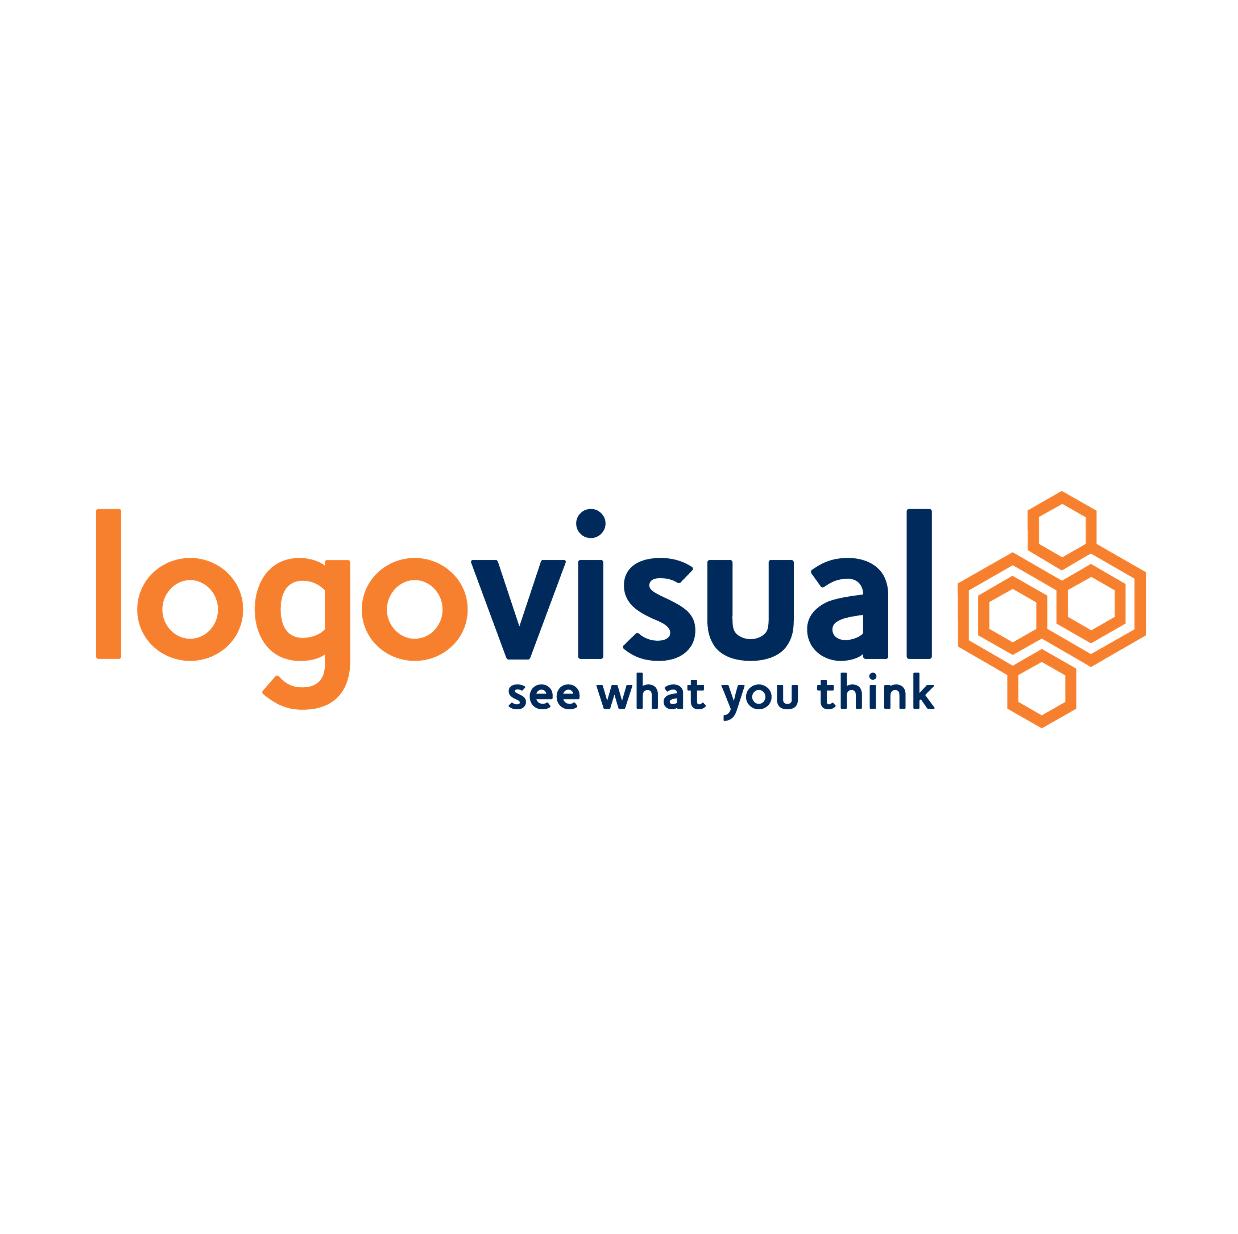 Logovisual